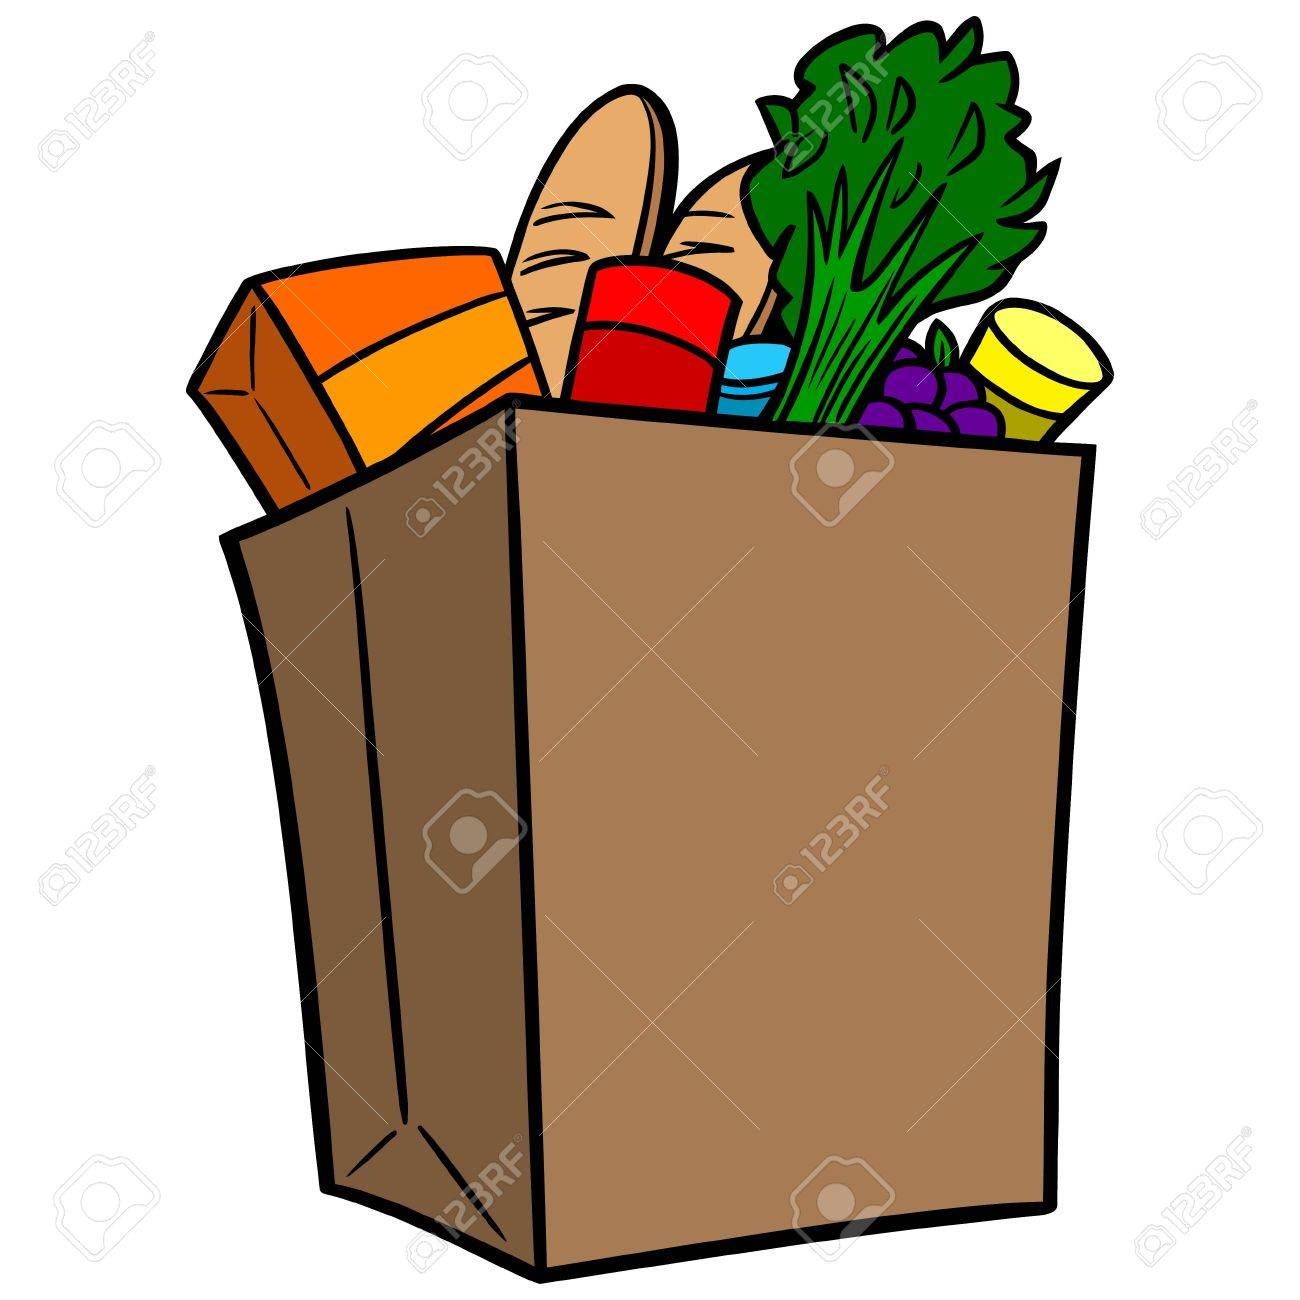 Grocery Bag - 57535367